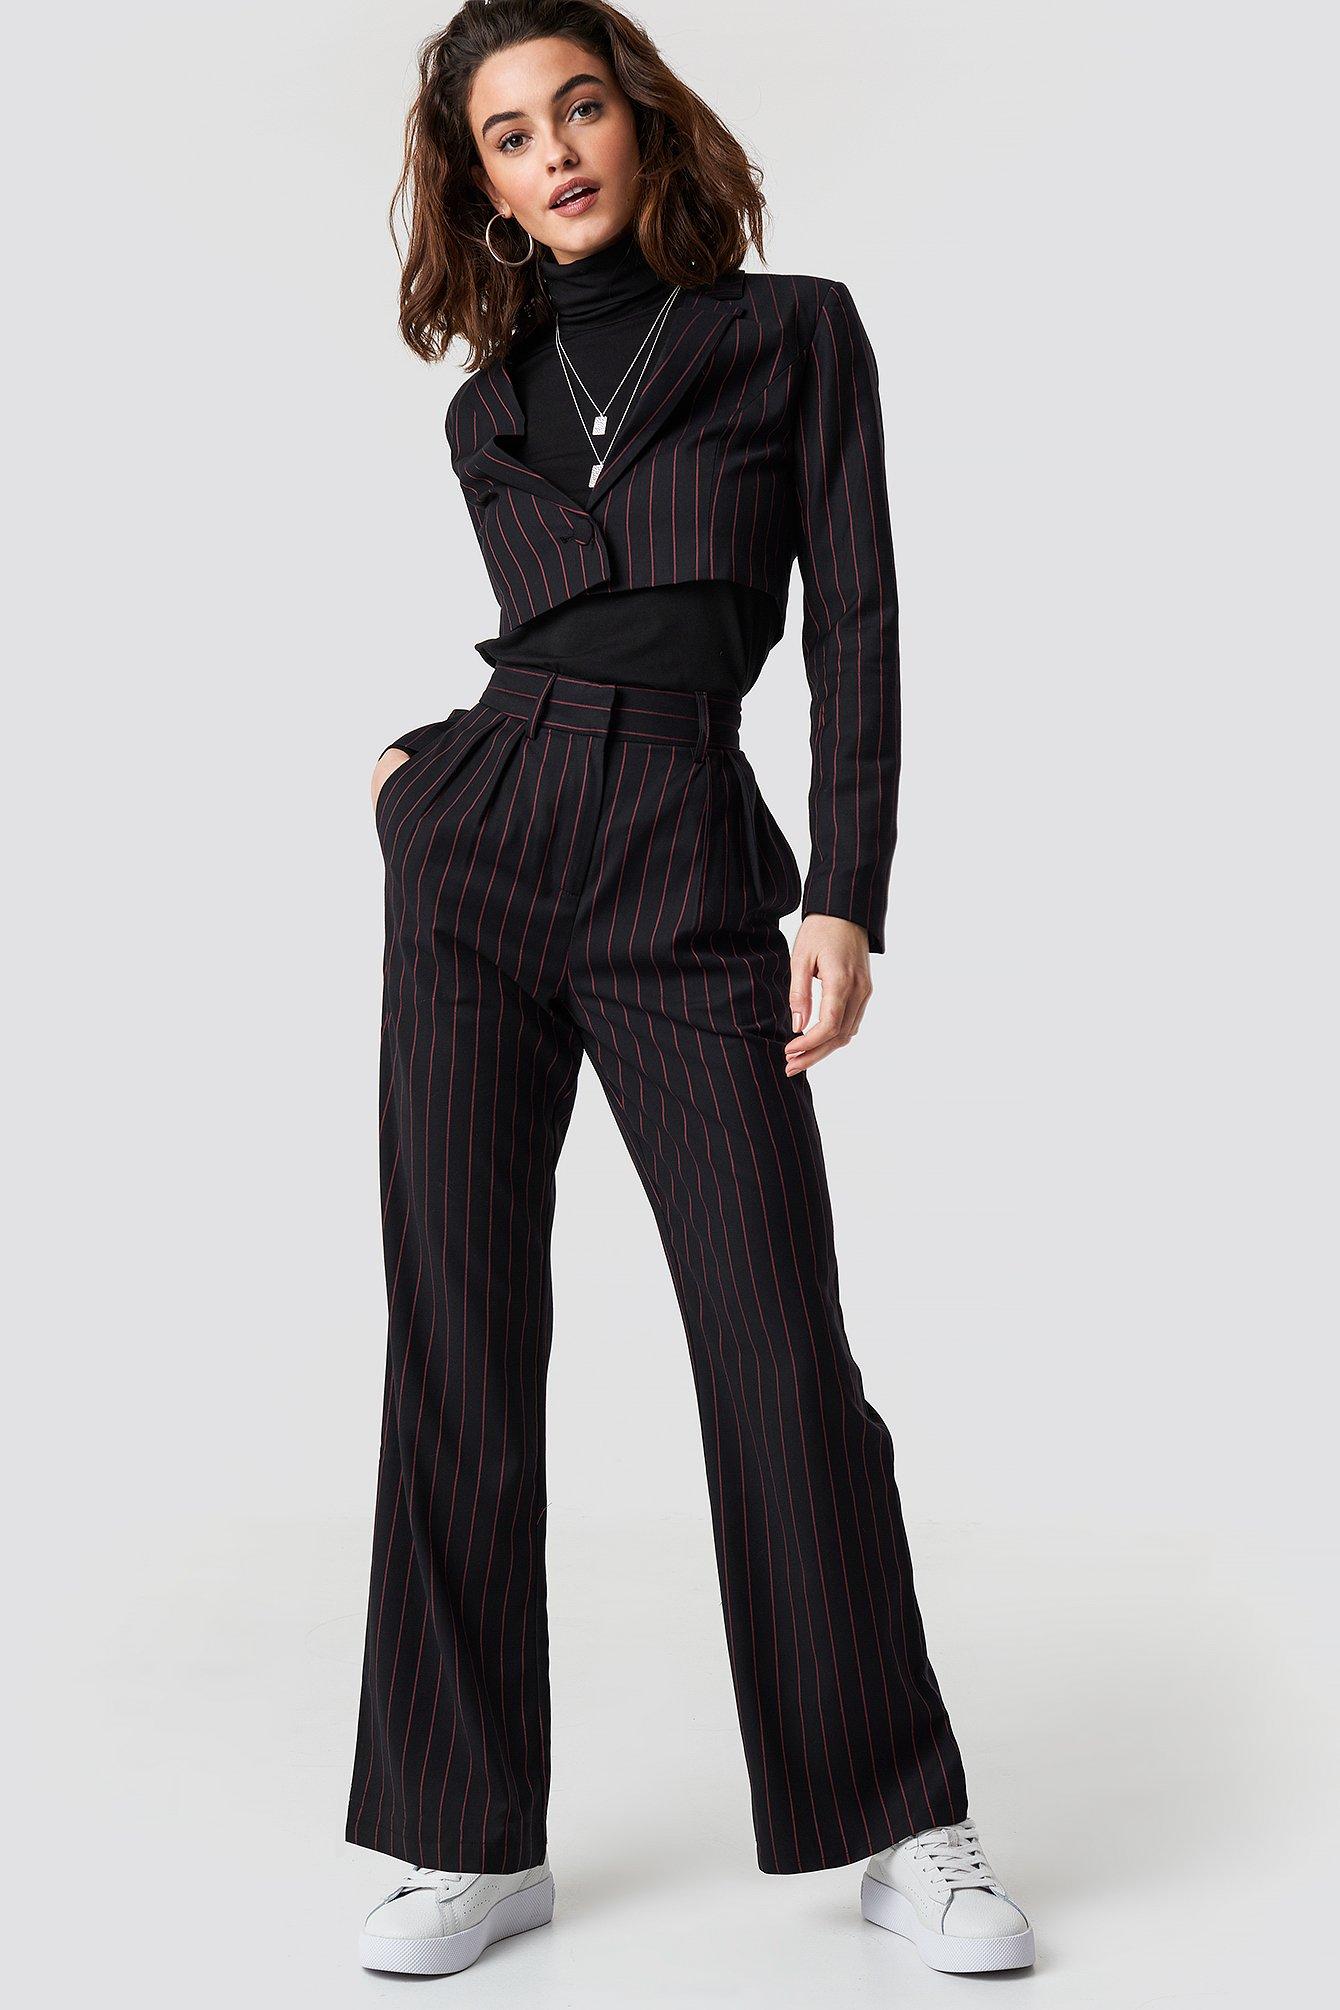 emilie briting x na-kd -  Pinstriped High Waist Flared Pants - Black